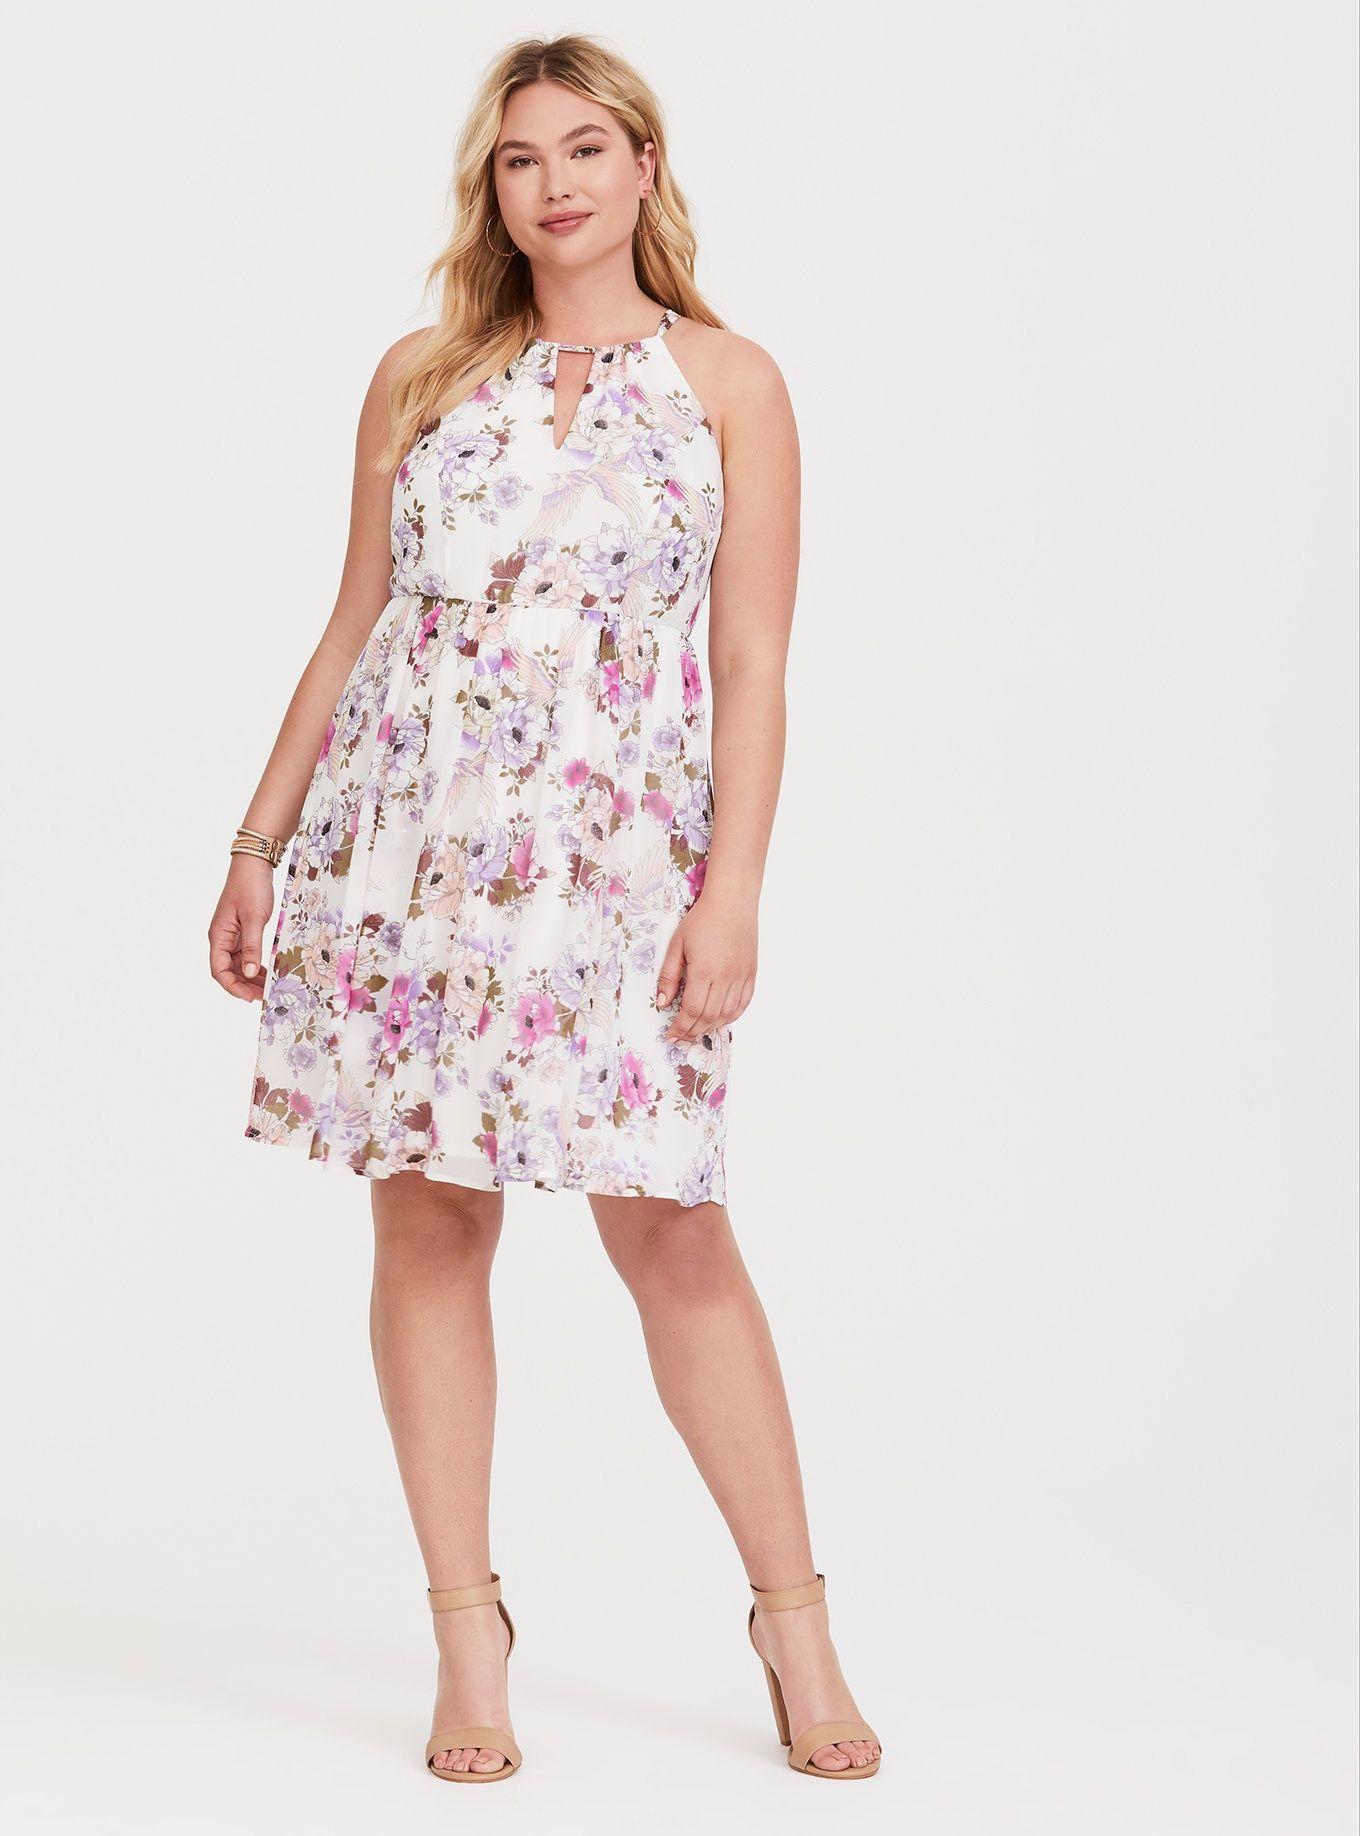 Ivory Floral Chiffon Mini Dress Dresses, Floral chiffon